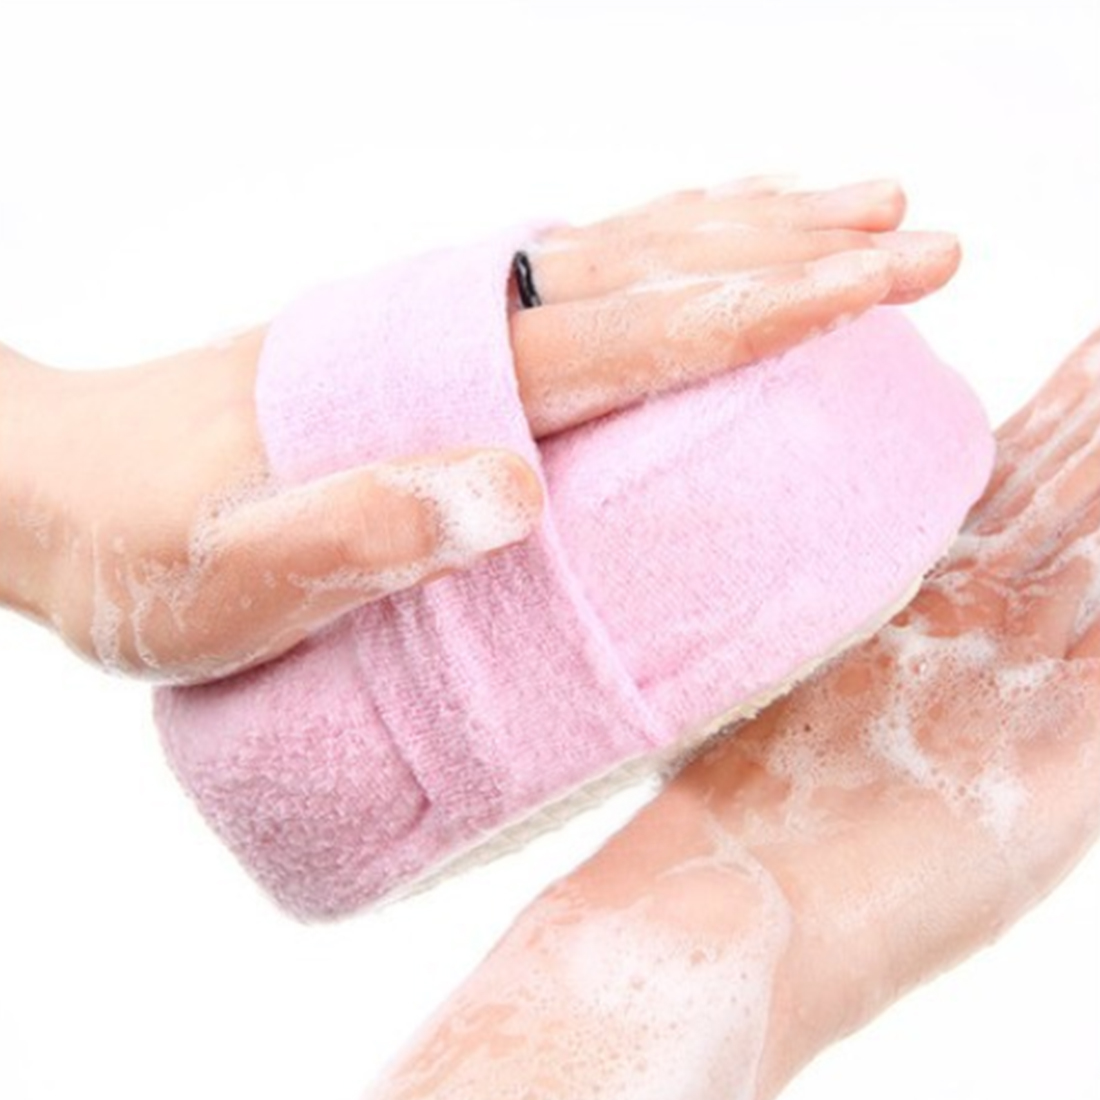 New Massager Shower Back Spa Scrubber Bath Ball Bath Tubs Cool Ball Bath Towel Scrubber Body Cleaning Mesh Shower Wash Sponge